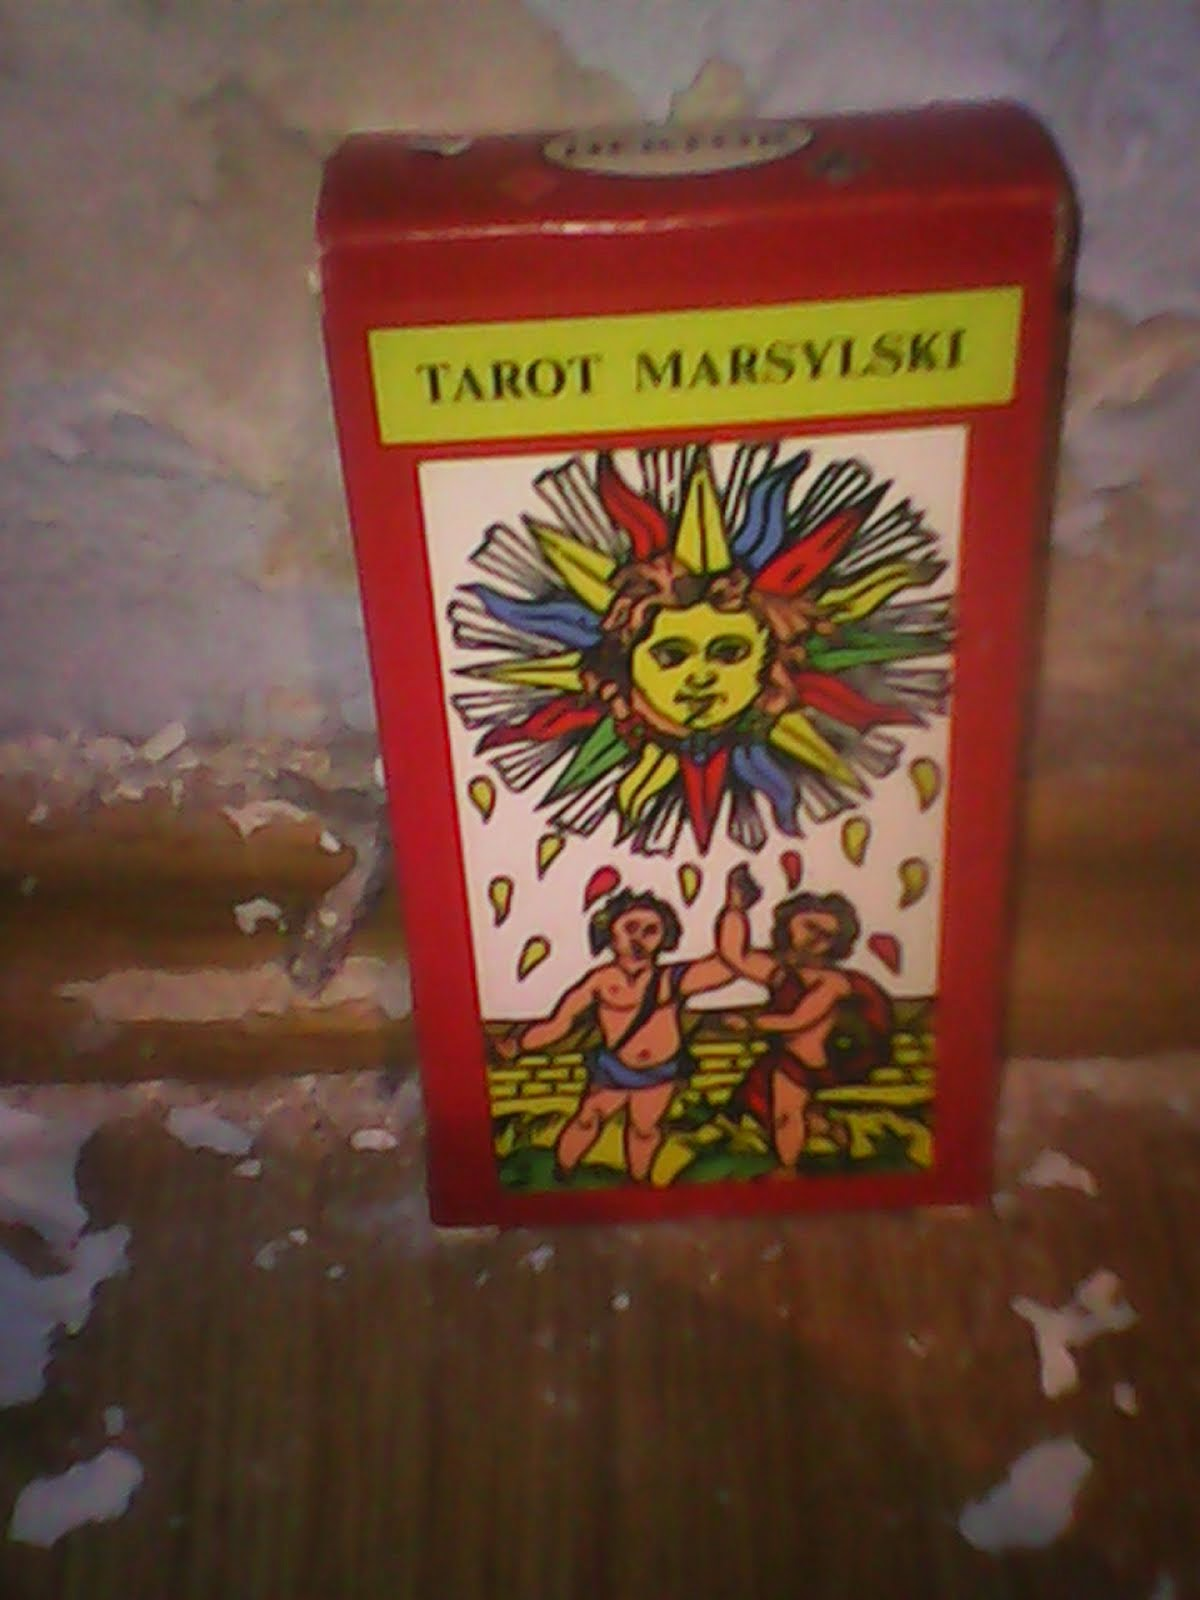 Tarot.